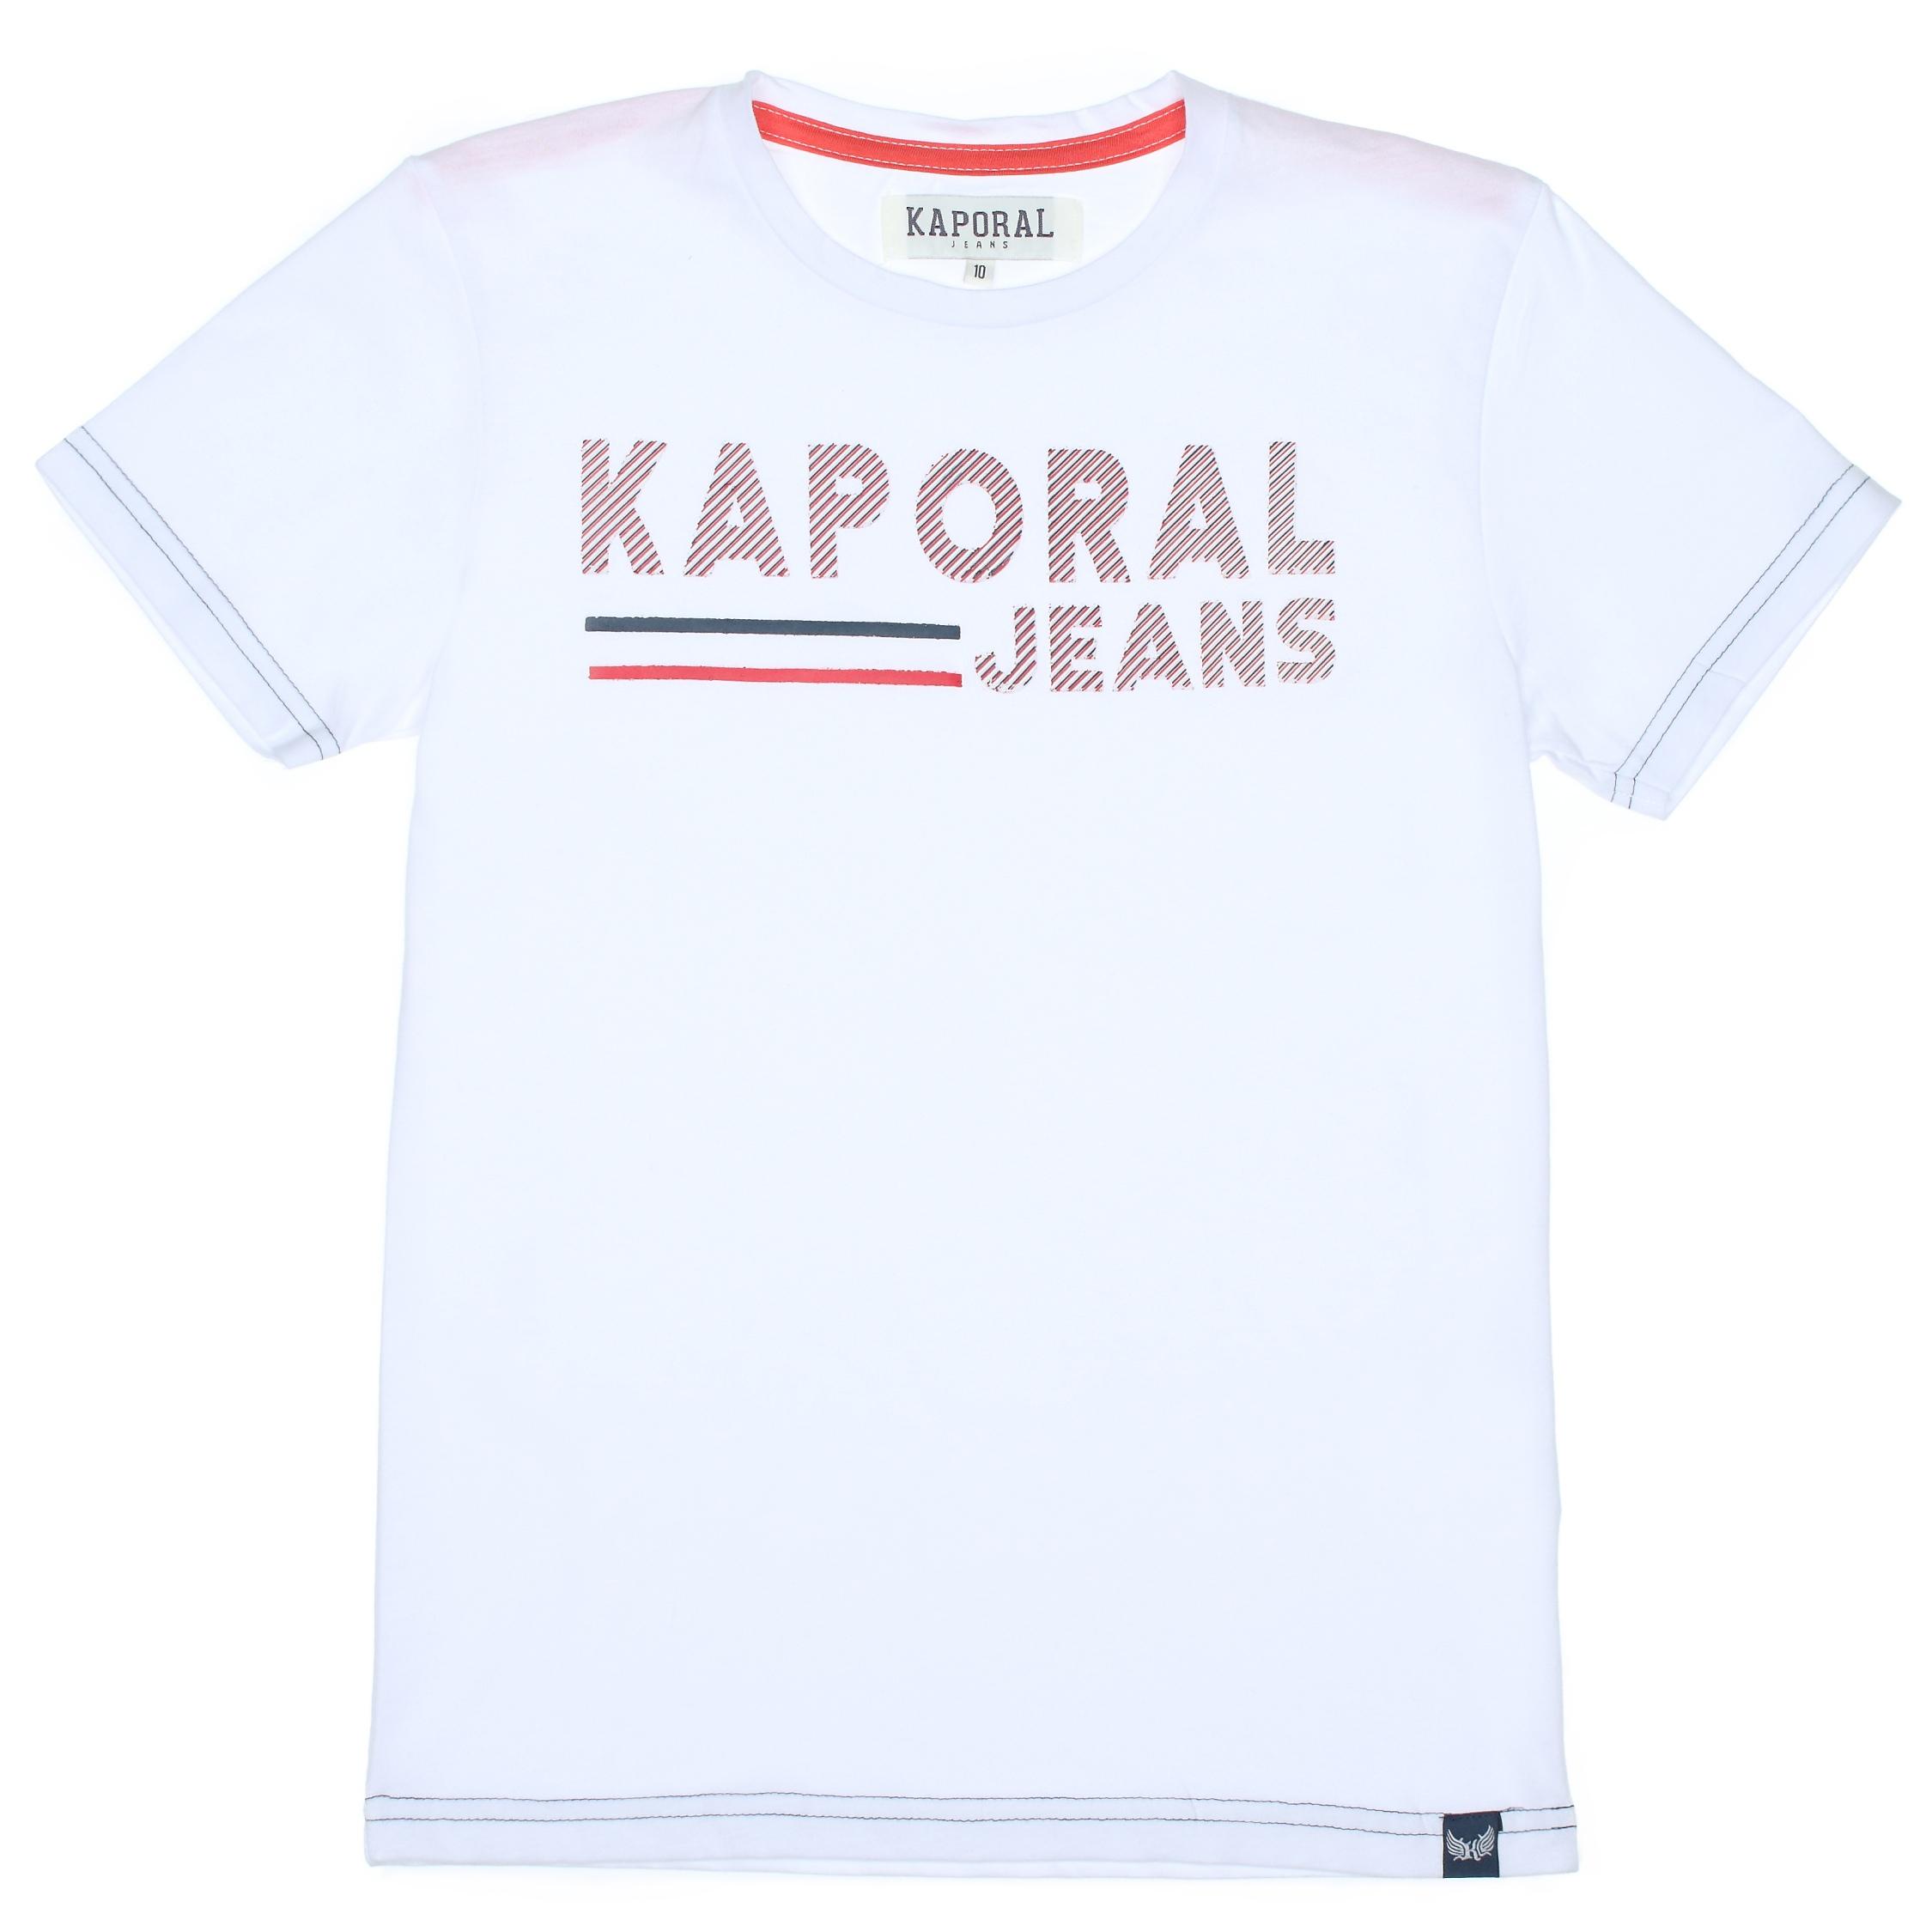 https://www.leadermode.com/186345/kaporal-ezio-optical-white.jpg